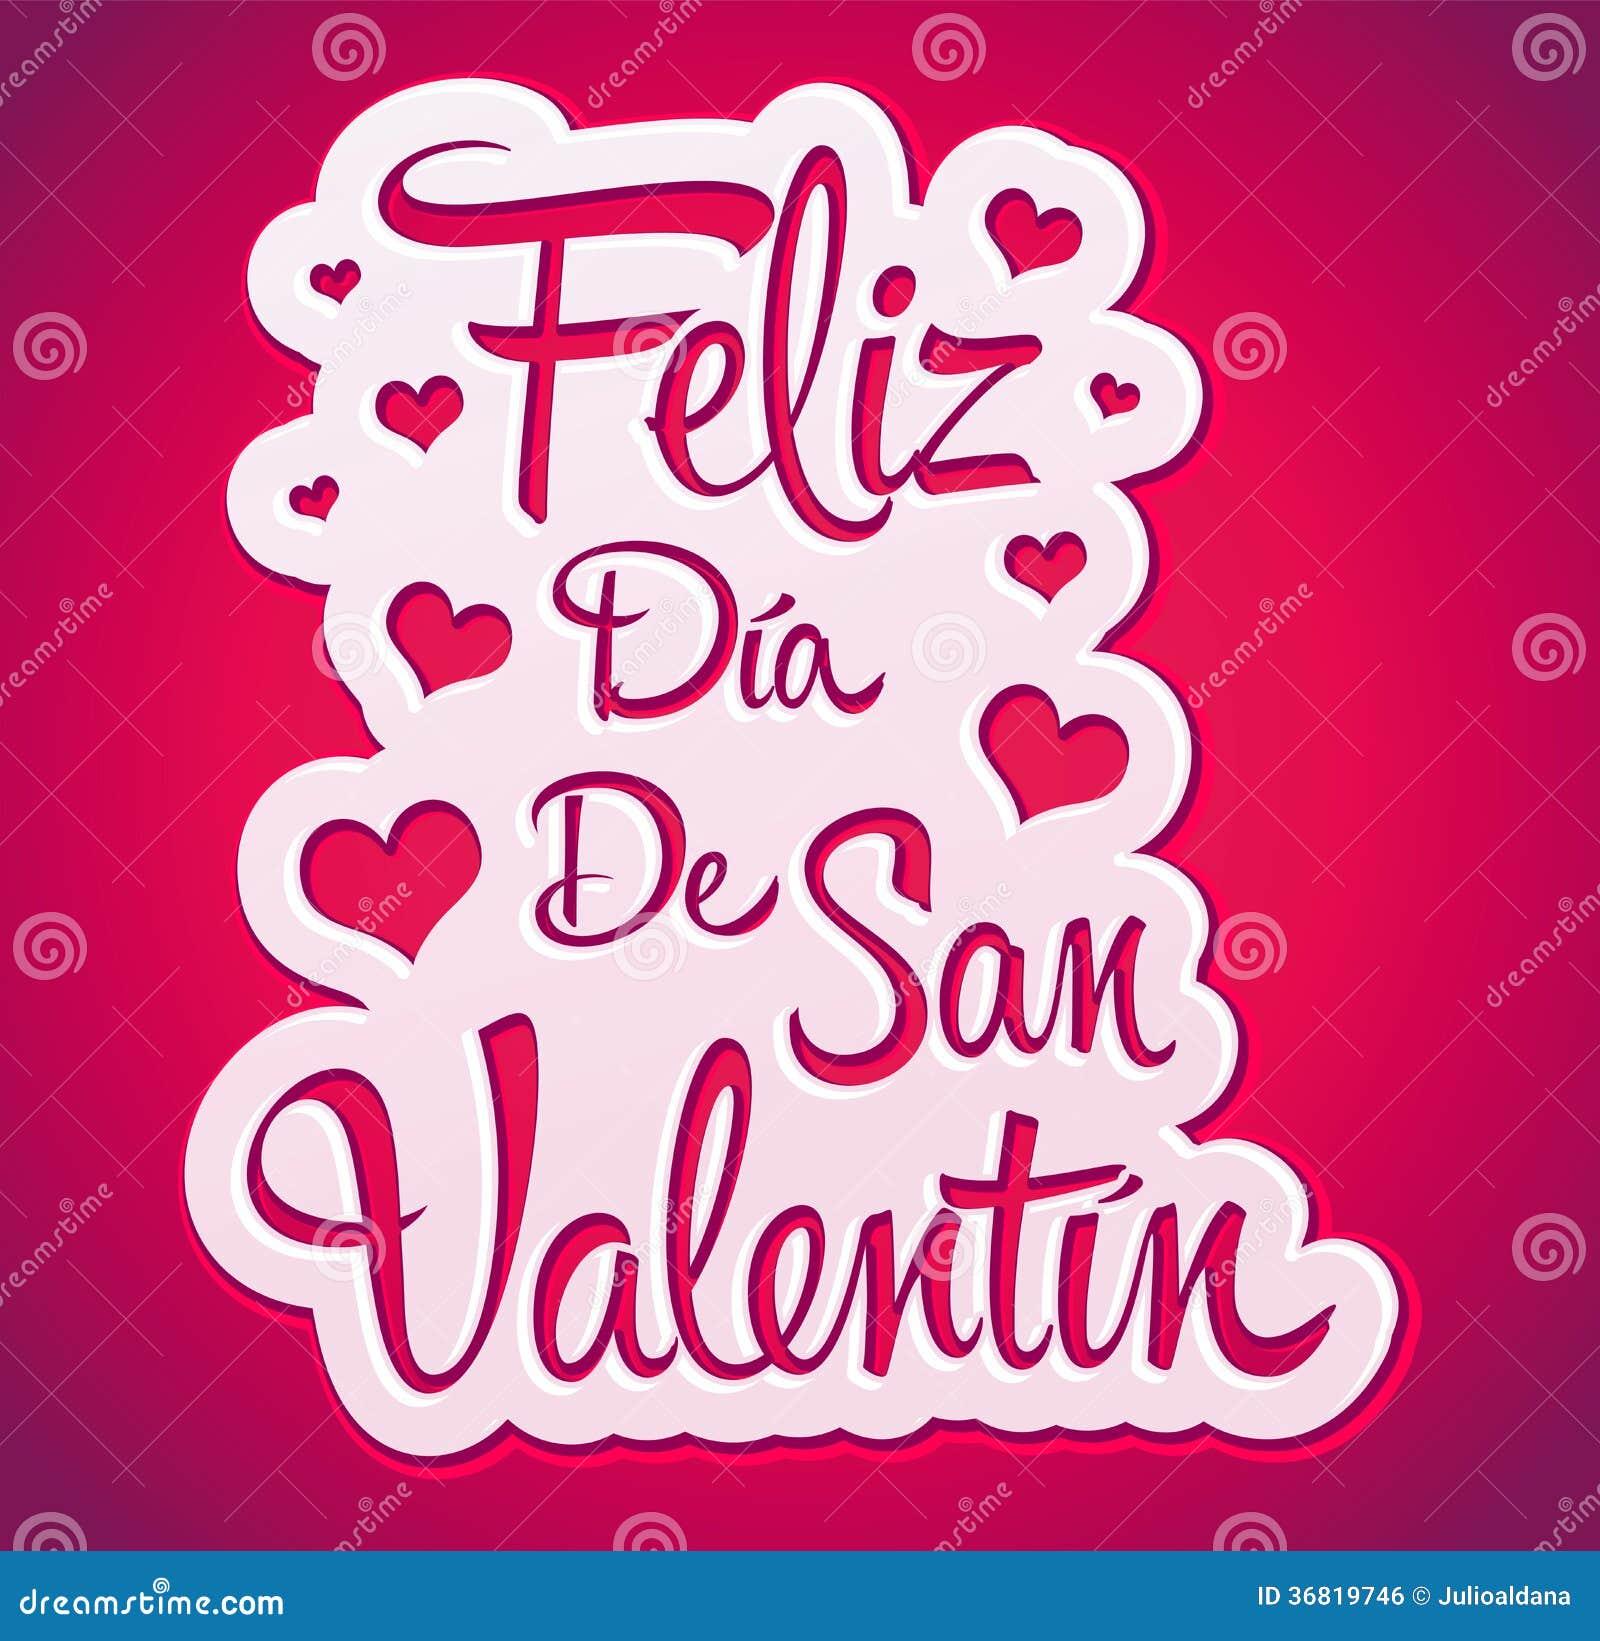 Feliz Dia de San Valentin - Happy Valentines day spanish text - peeling  sticker - vector eps 8 available